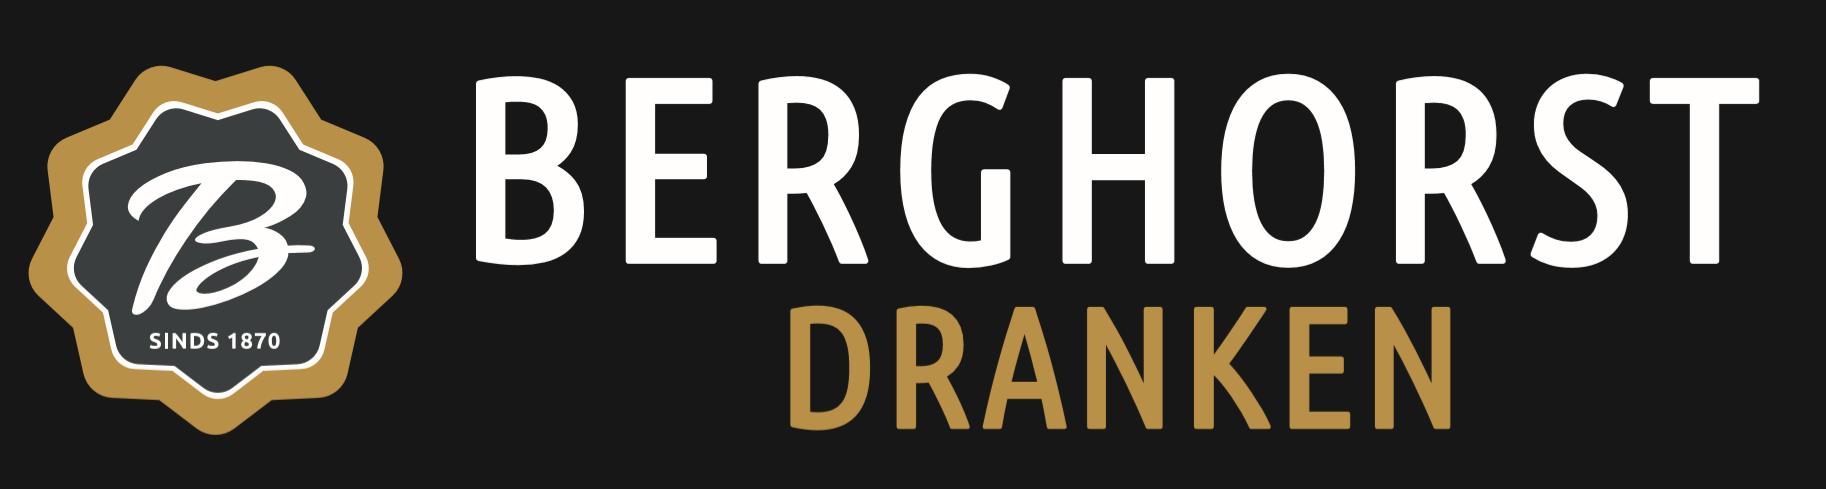 berghorst-logo